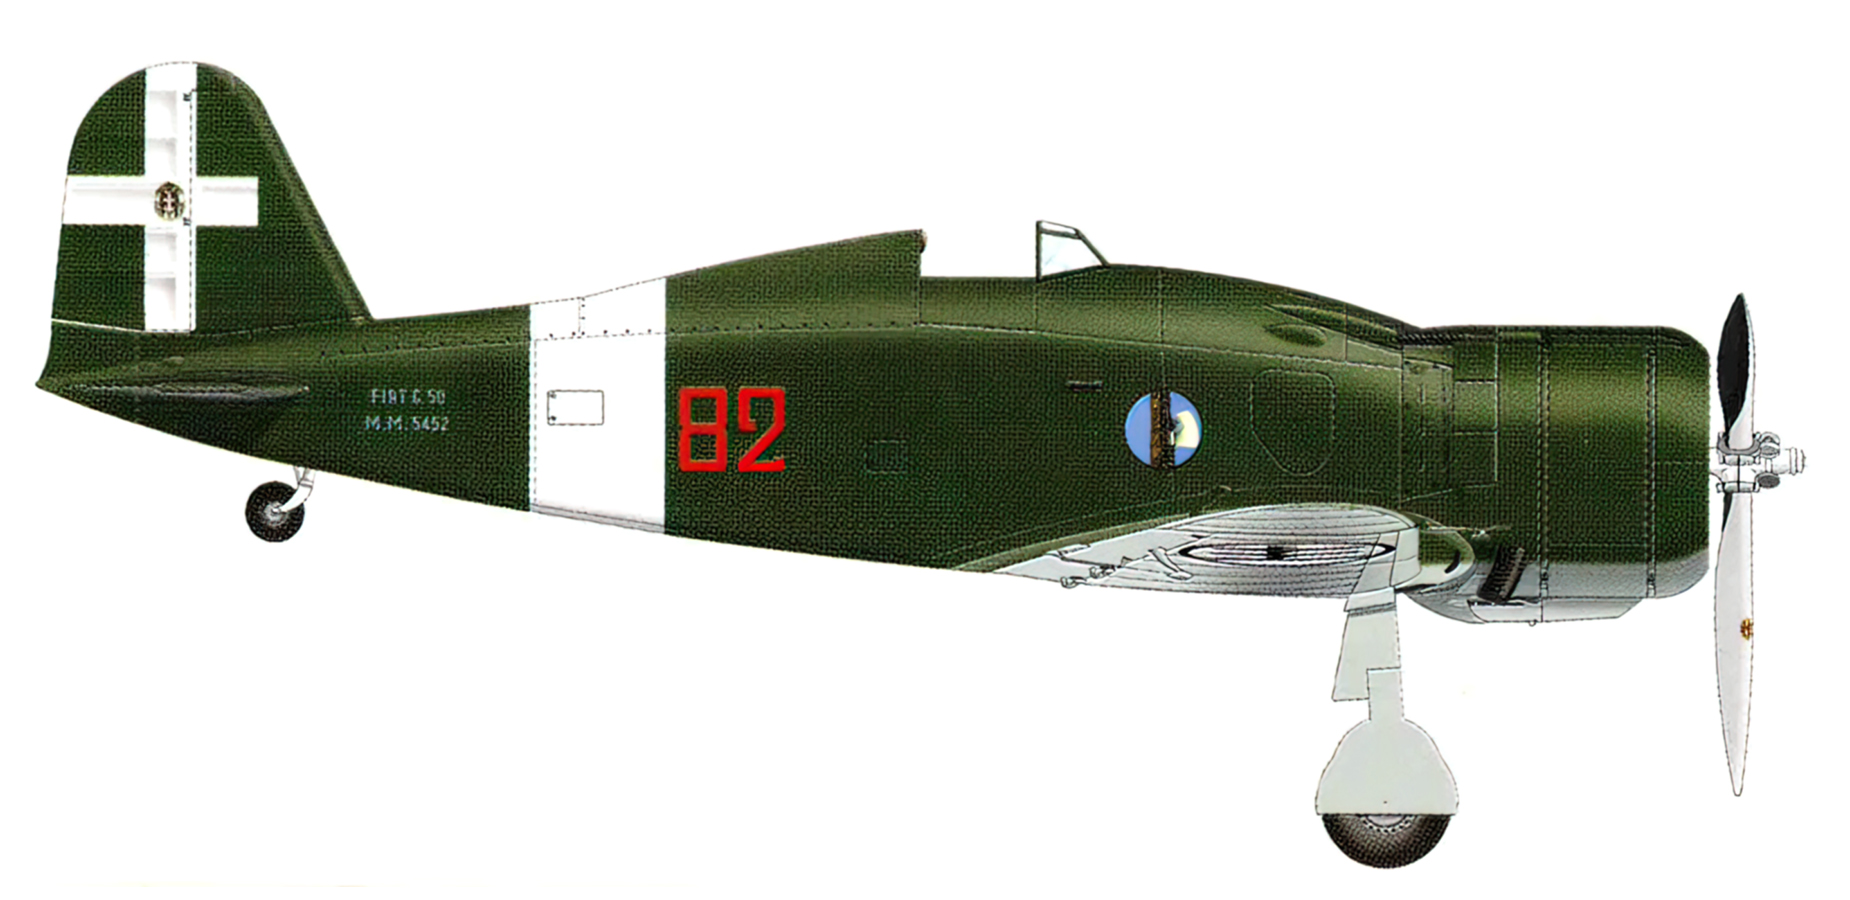 Fiat G50 Freccia prototype 82 MM5452 Gruppo Complementare Italy 1942 0A